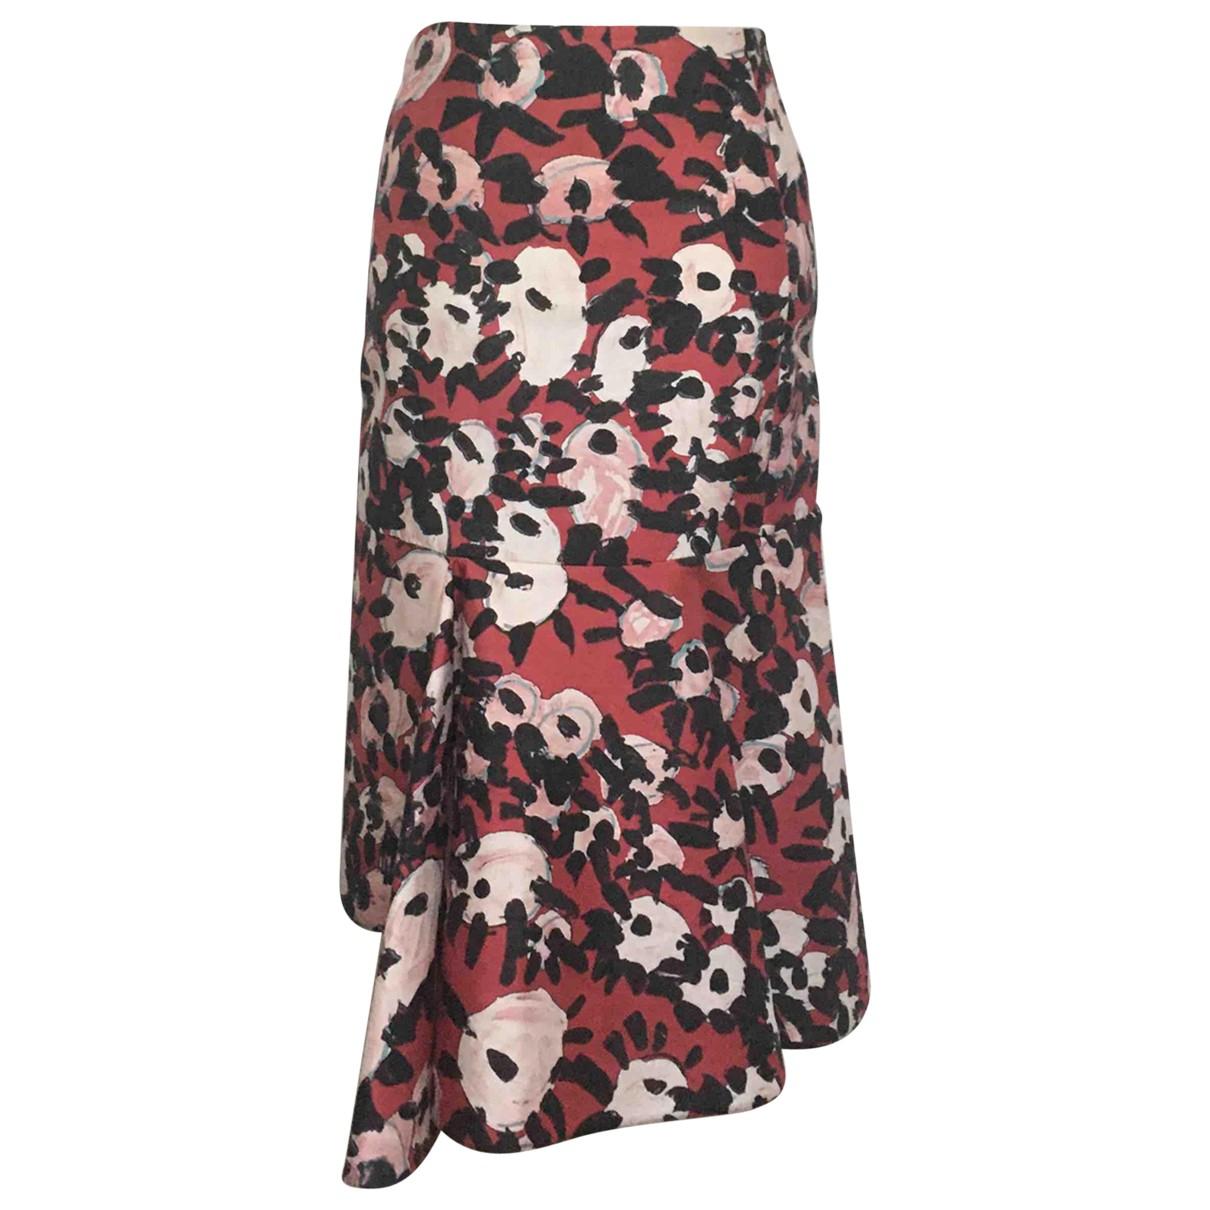 Marni N Cotton skirt for Women 38 IT